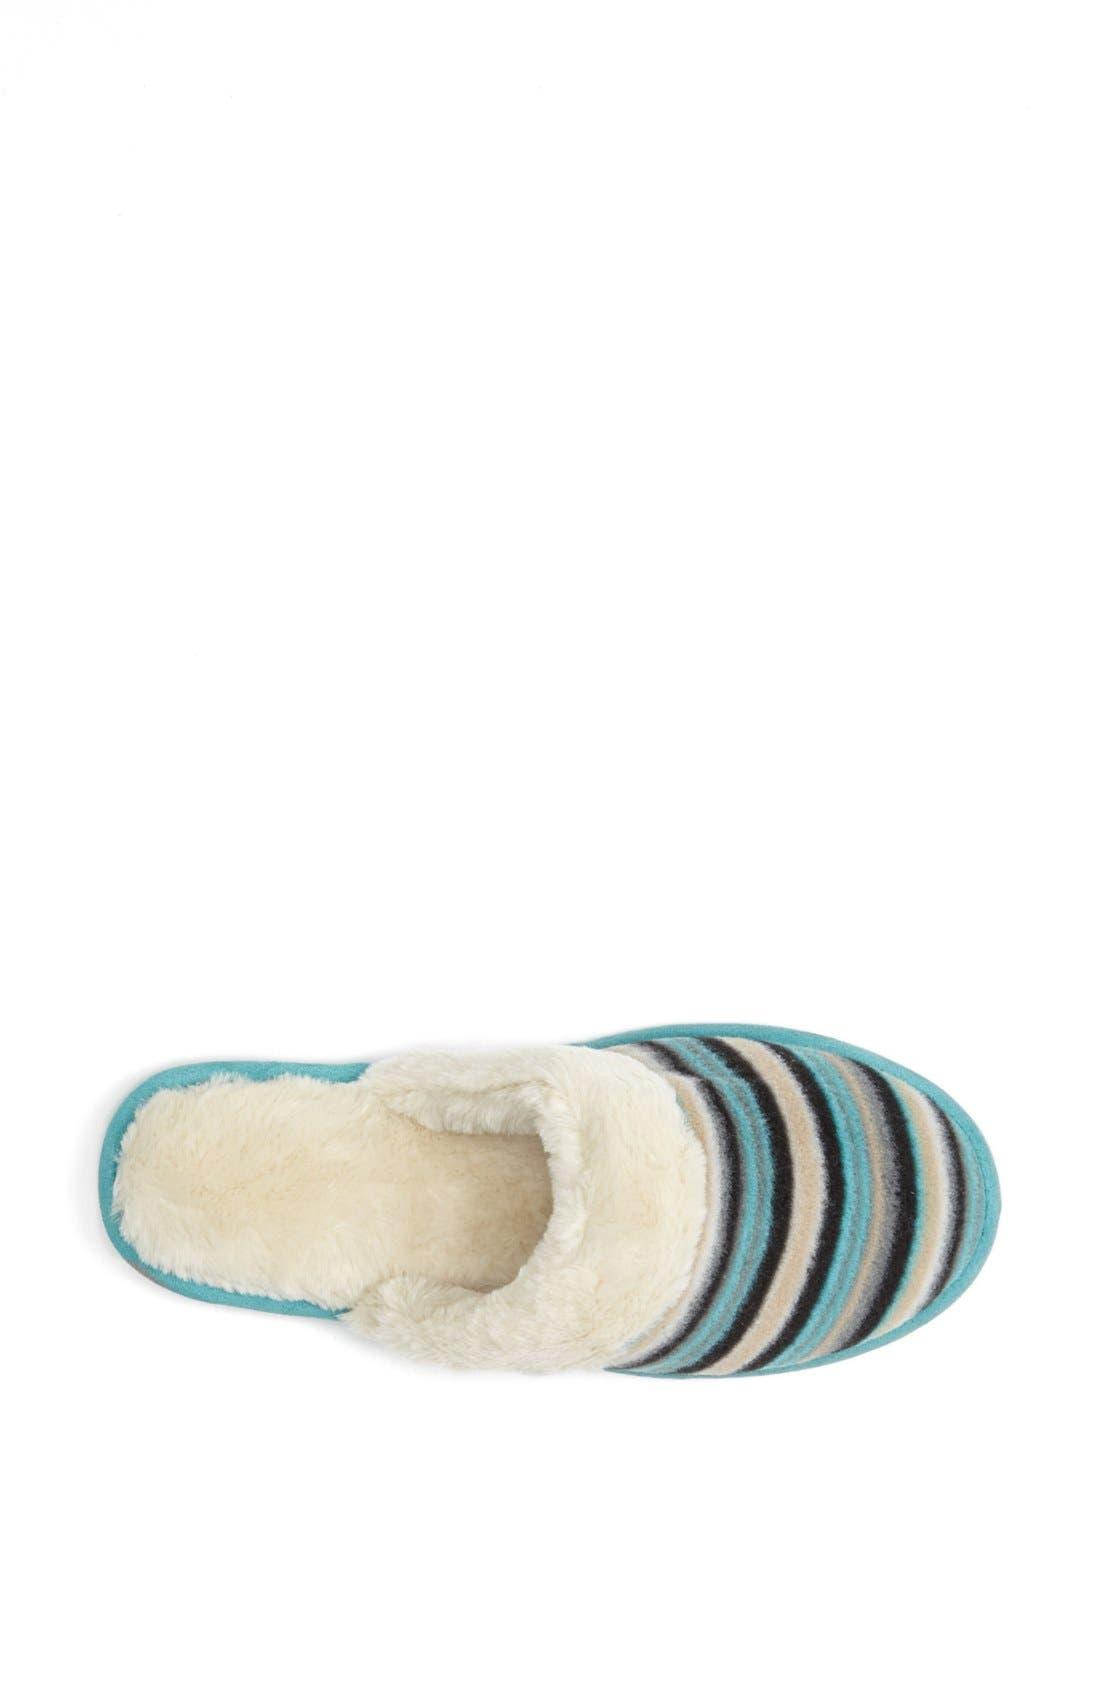 Alternate Image 3  - Acorn 'Polar Scuff' Slipper